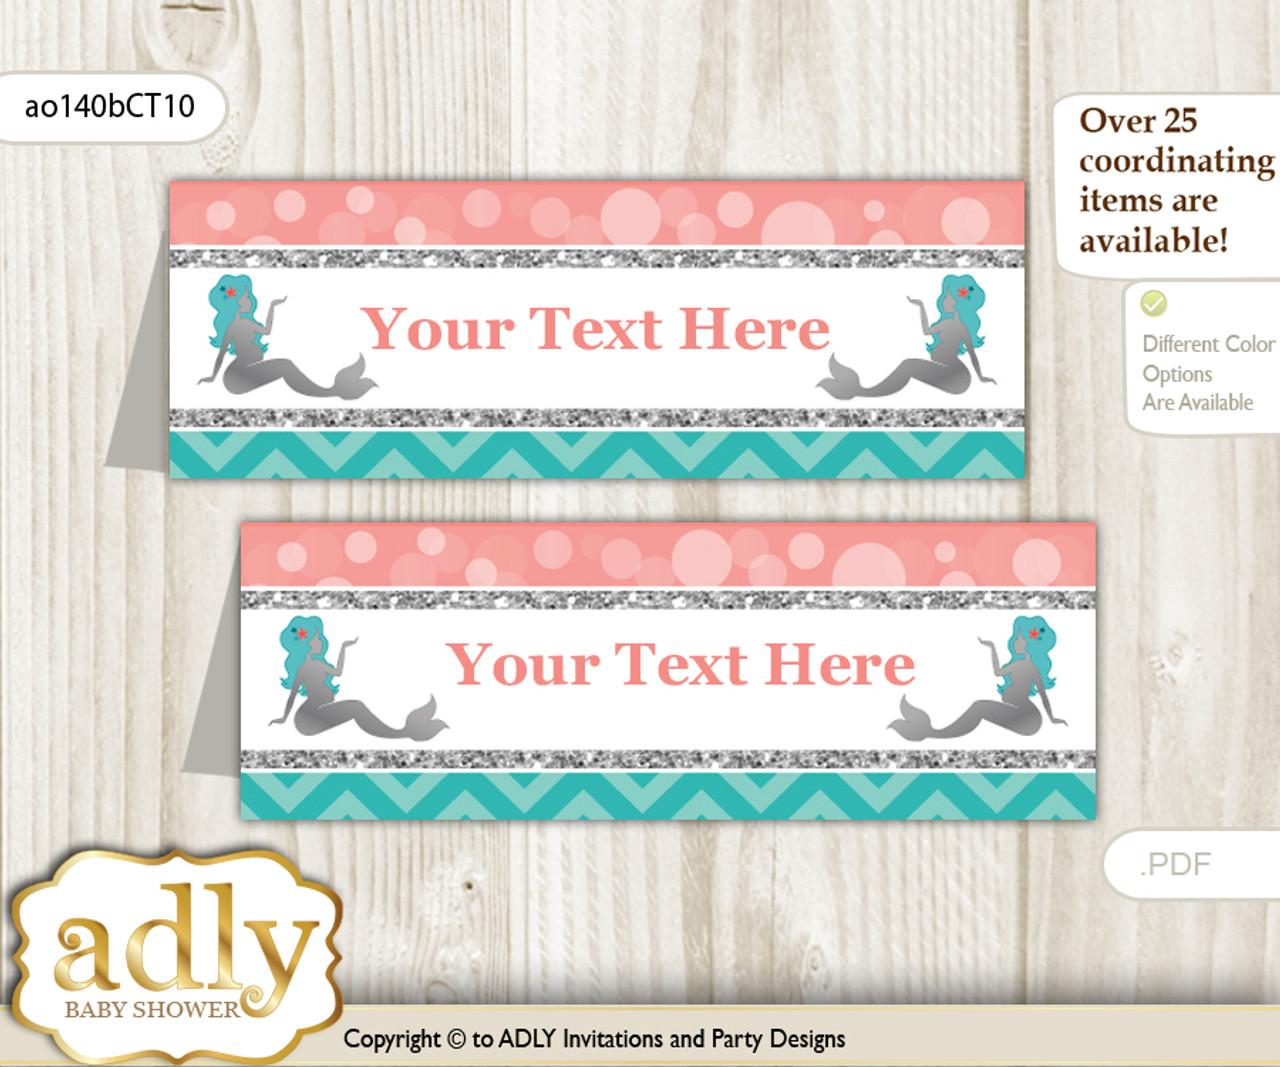 diy text editable printable mermaid girl buffet tags or food tent